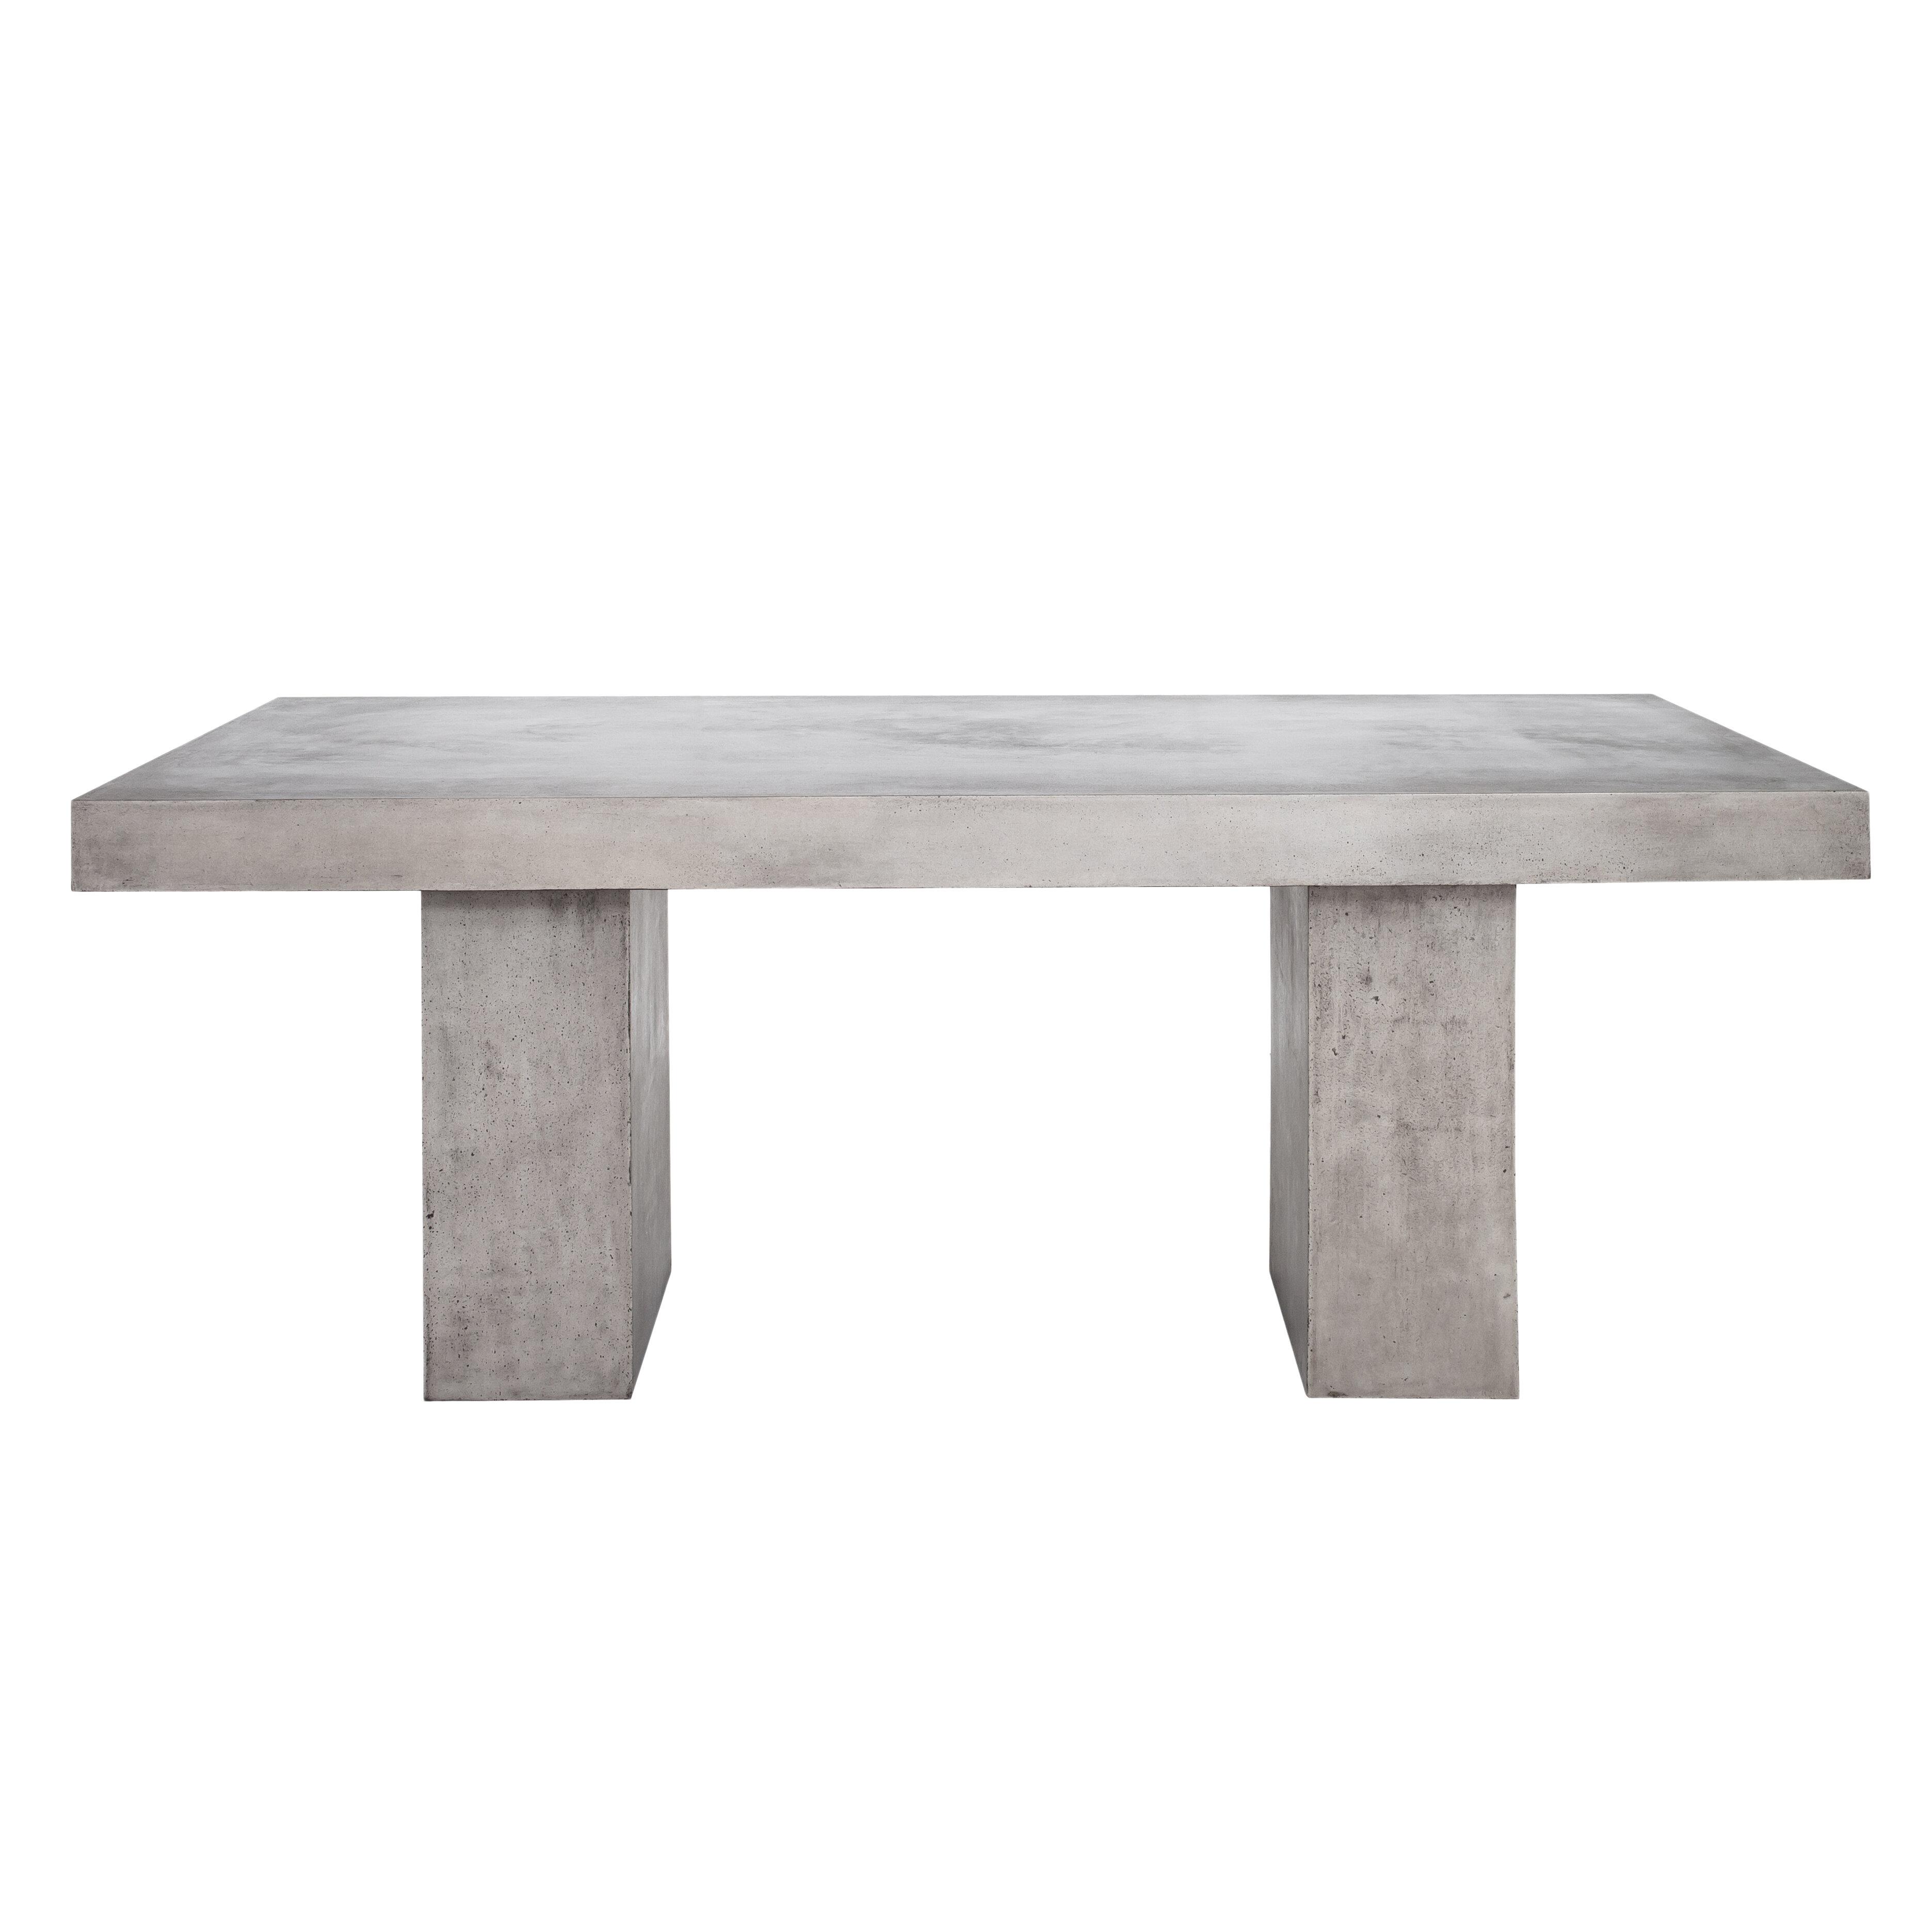 Dinsmore stone concrete dining table reviews allmodern